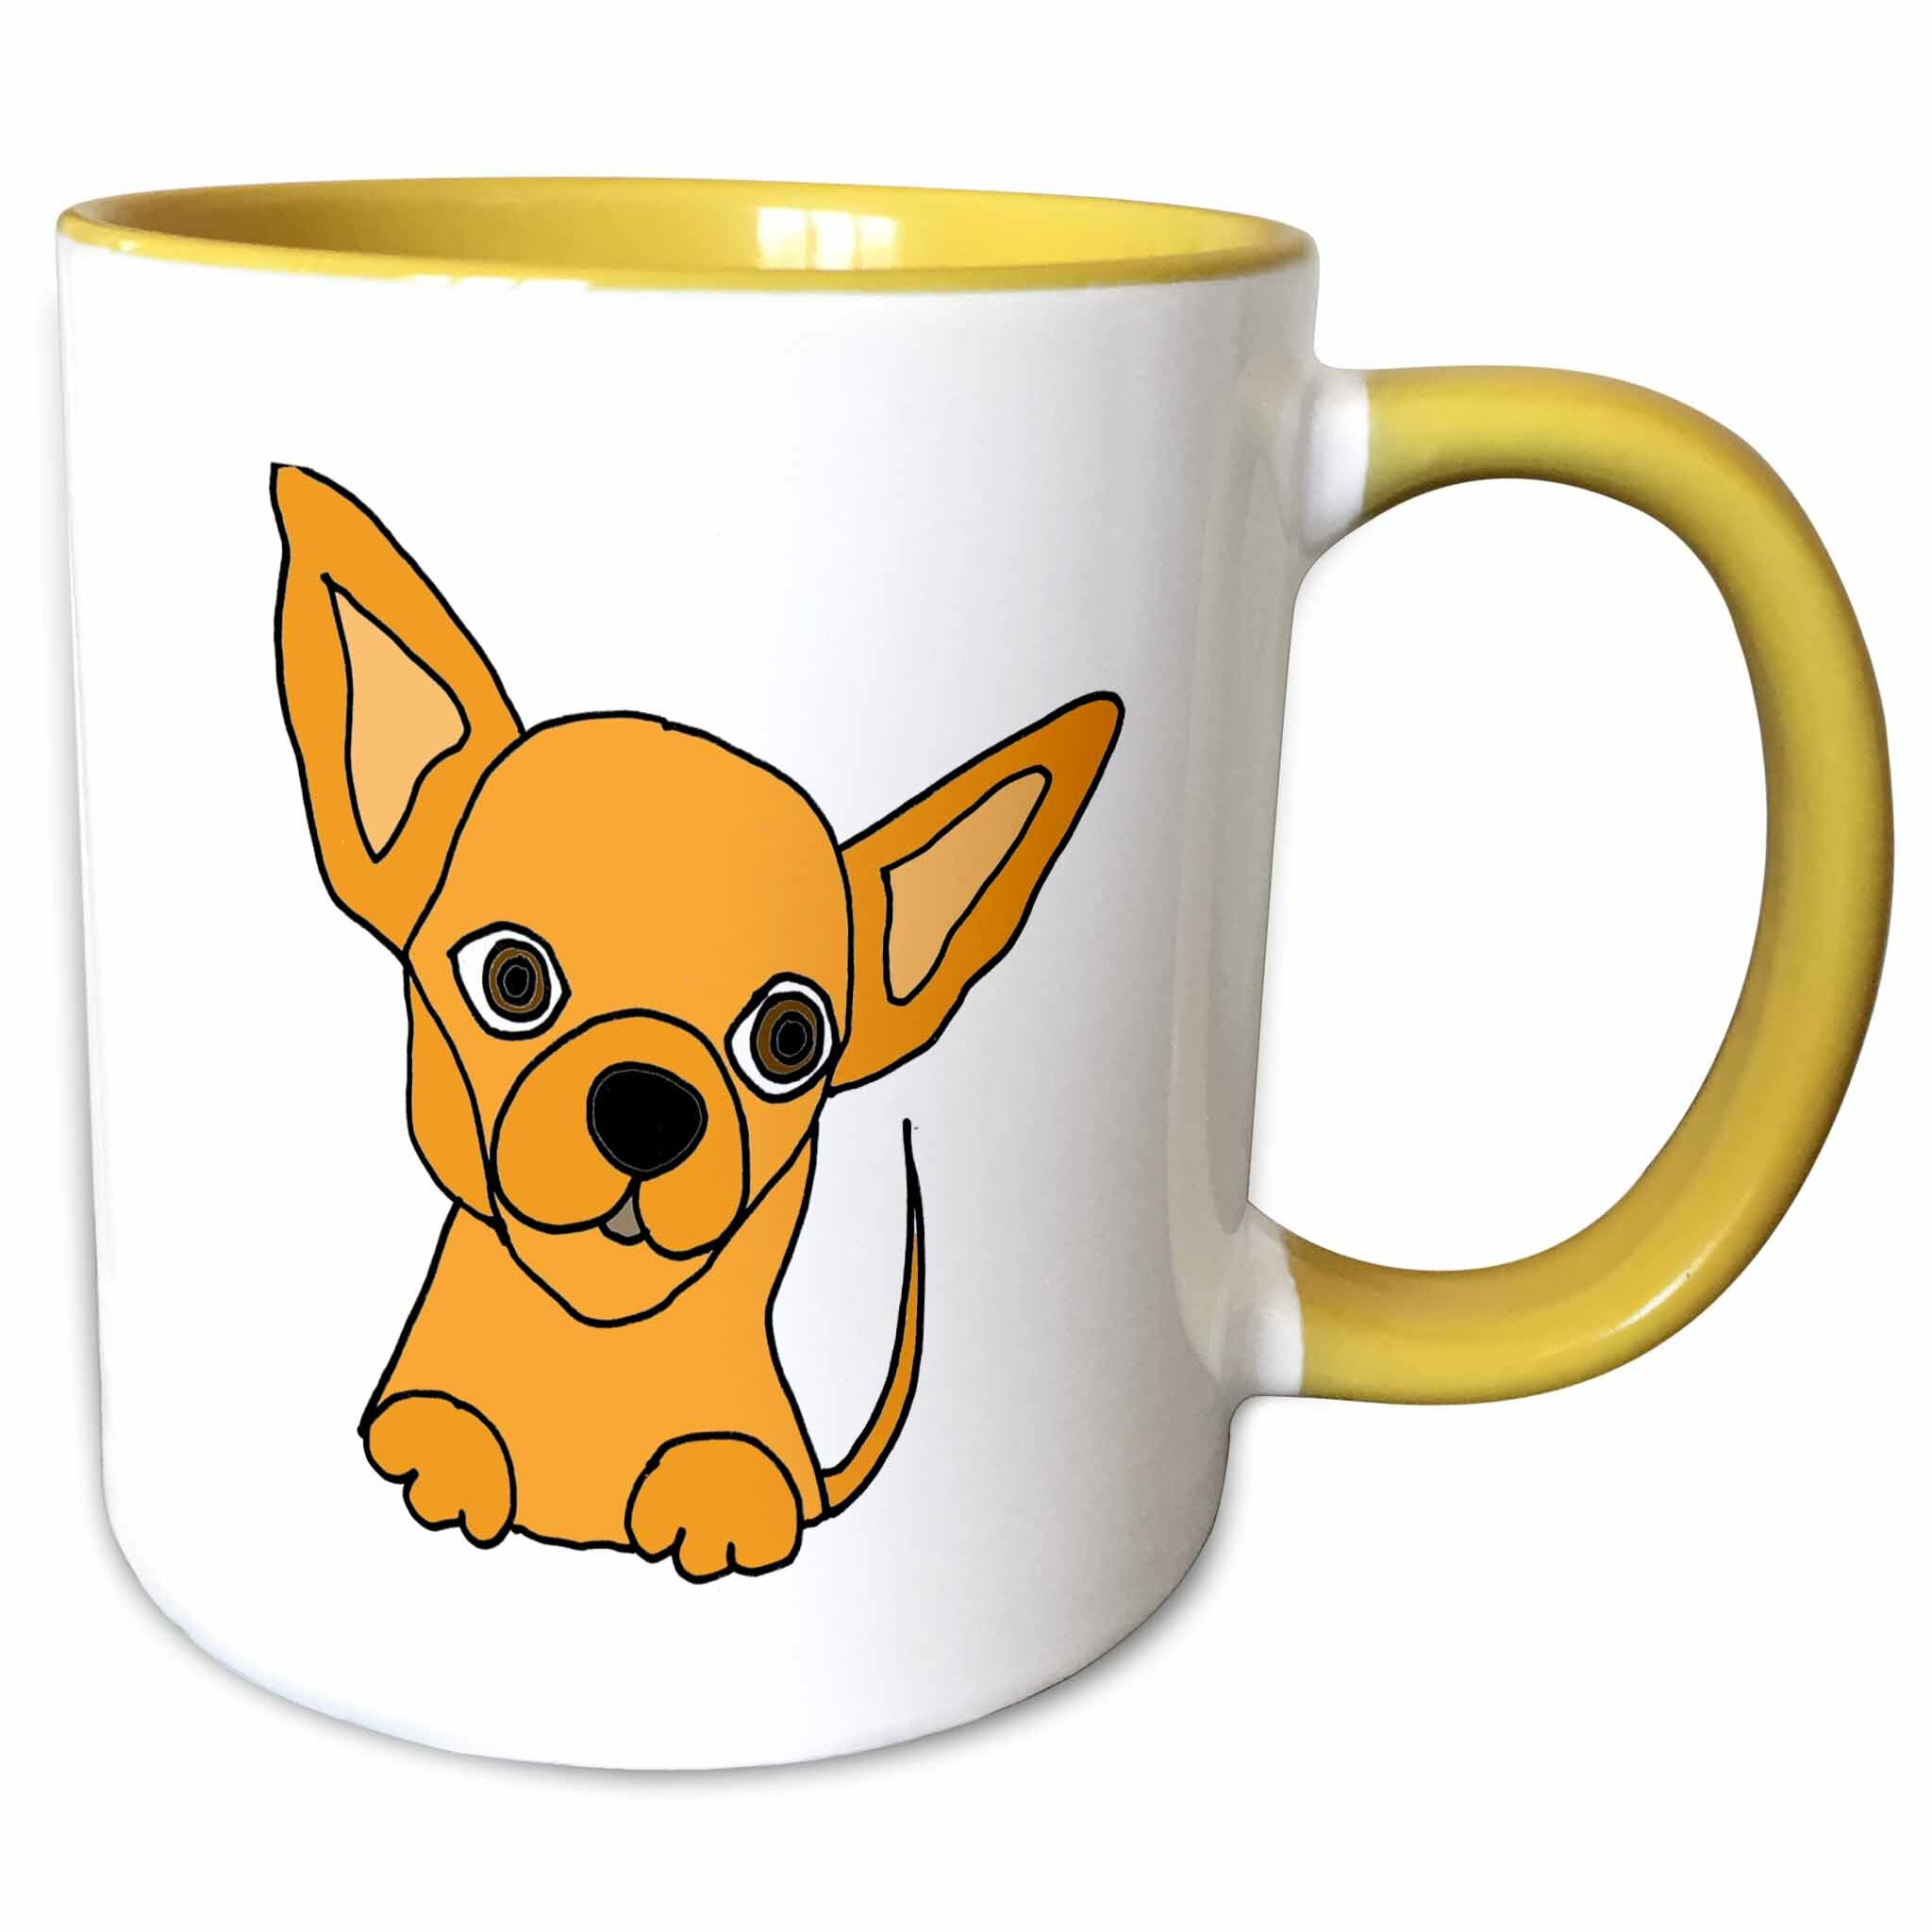 Symple Stuff Madeira Cute Chihuahua Puppy Dog Cartoon Coffee Mug Wayfair